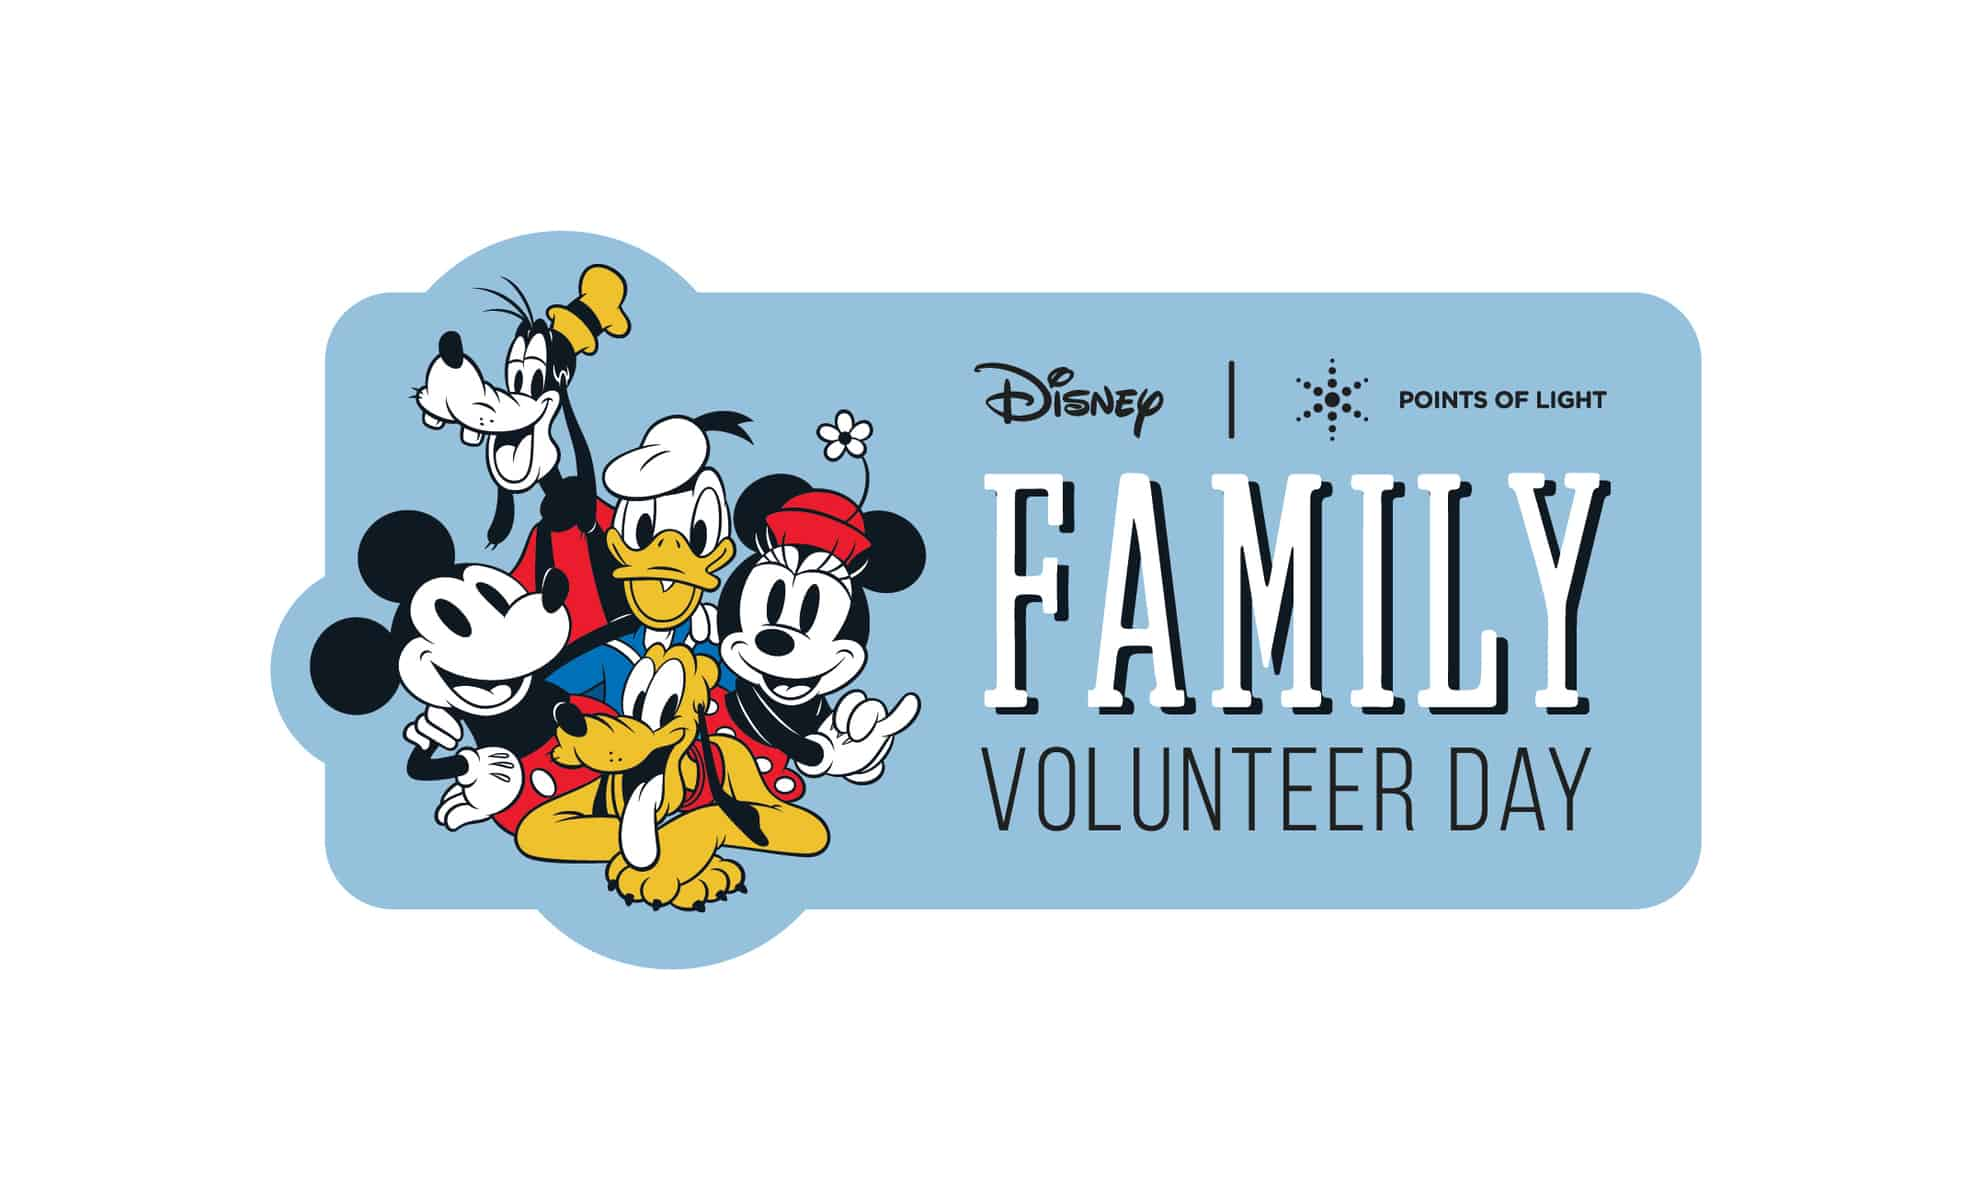 Family Volunteer Day at Walt Disney World